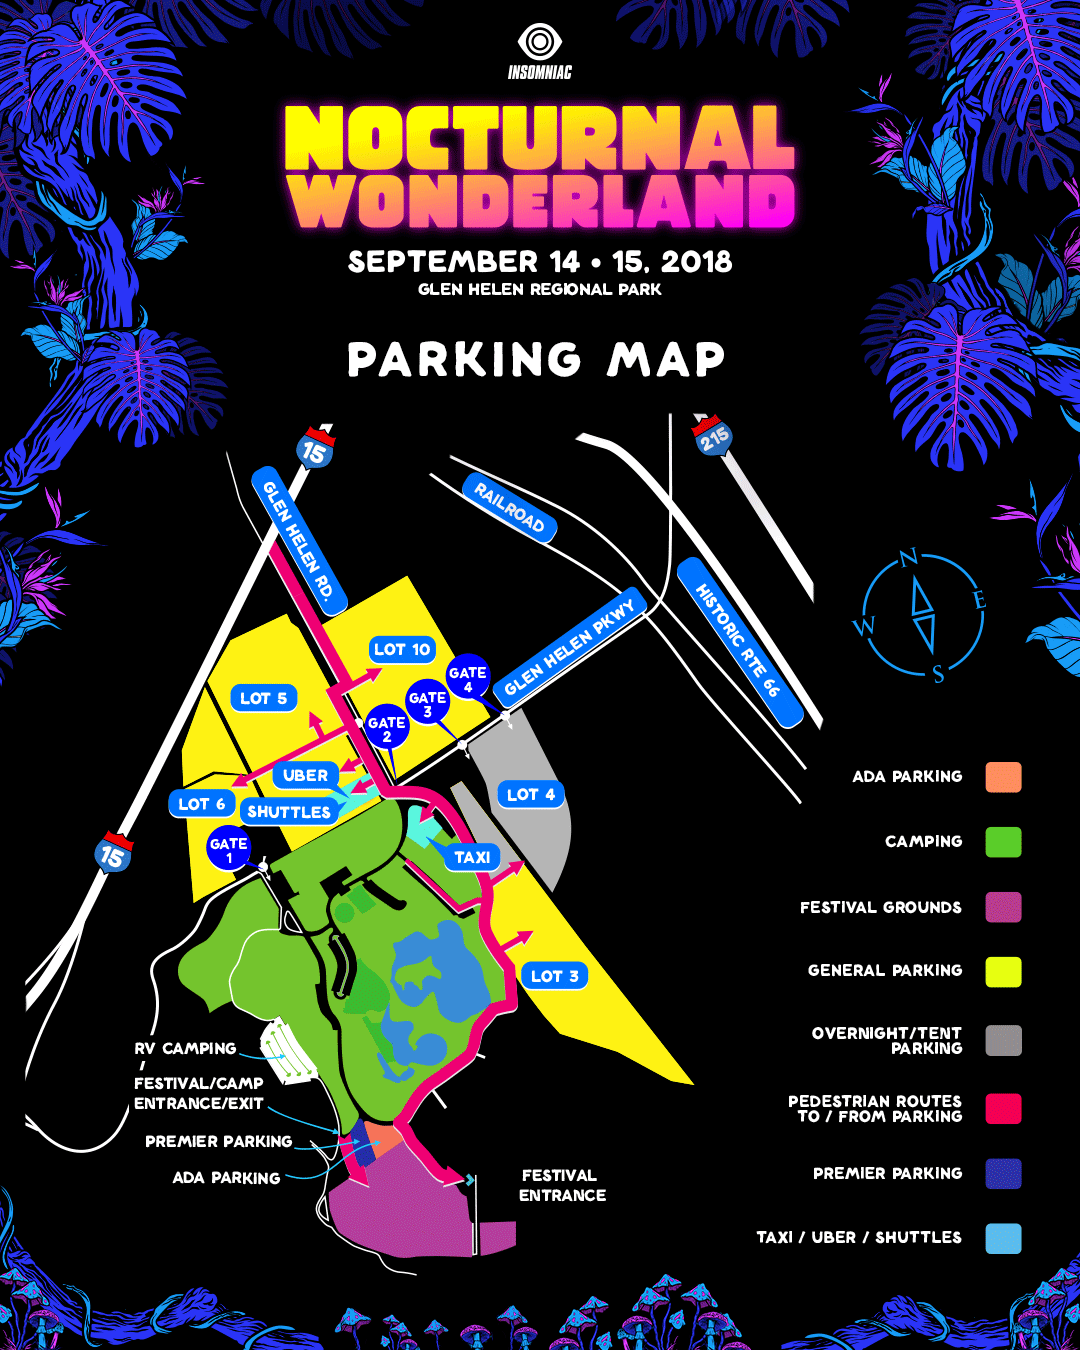 Nocturnal Wonderland 2018 Parking Map